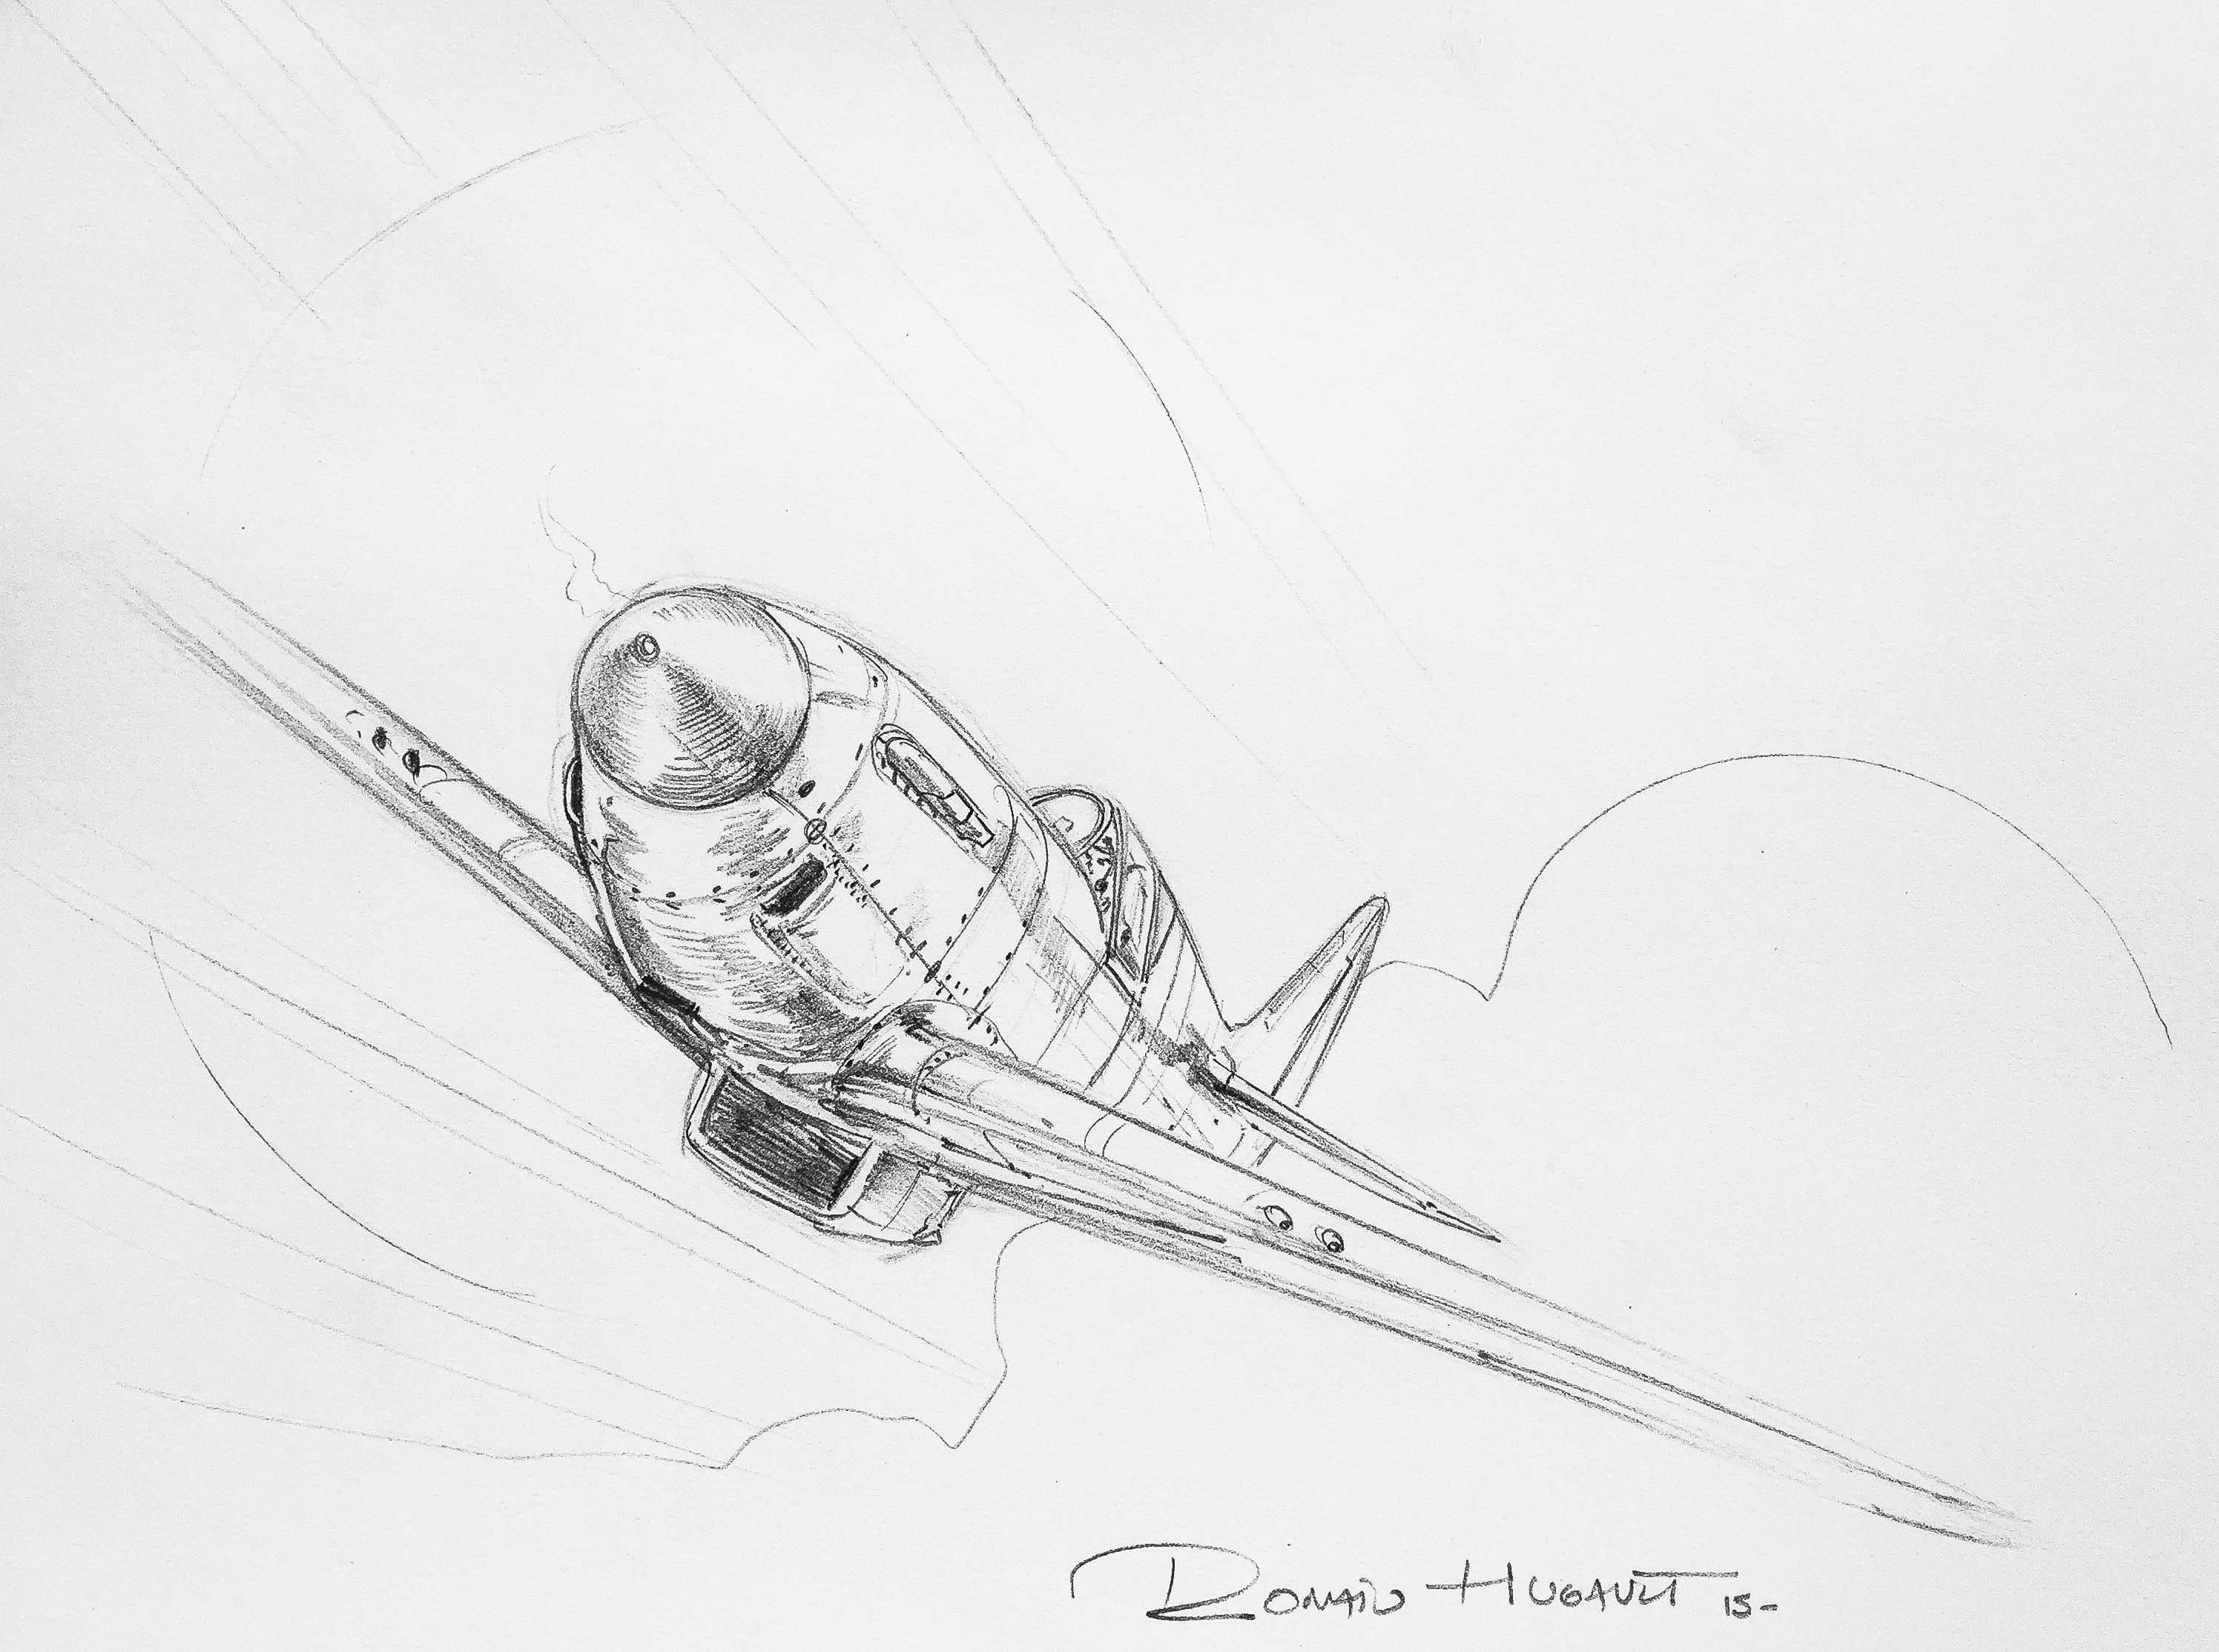 Hugault, RomainPC, (9), P-51D (4).jpg